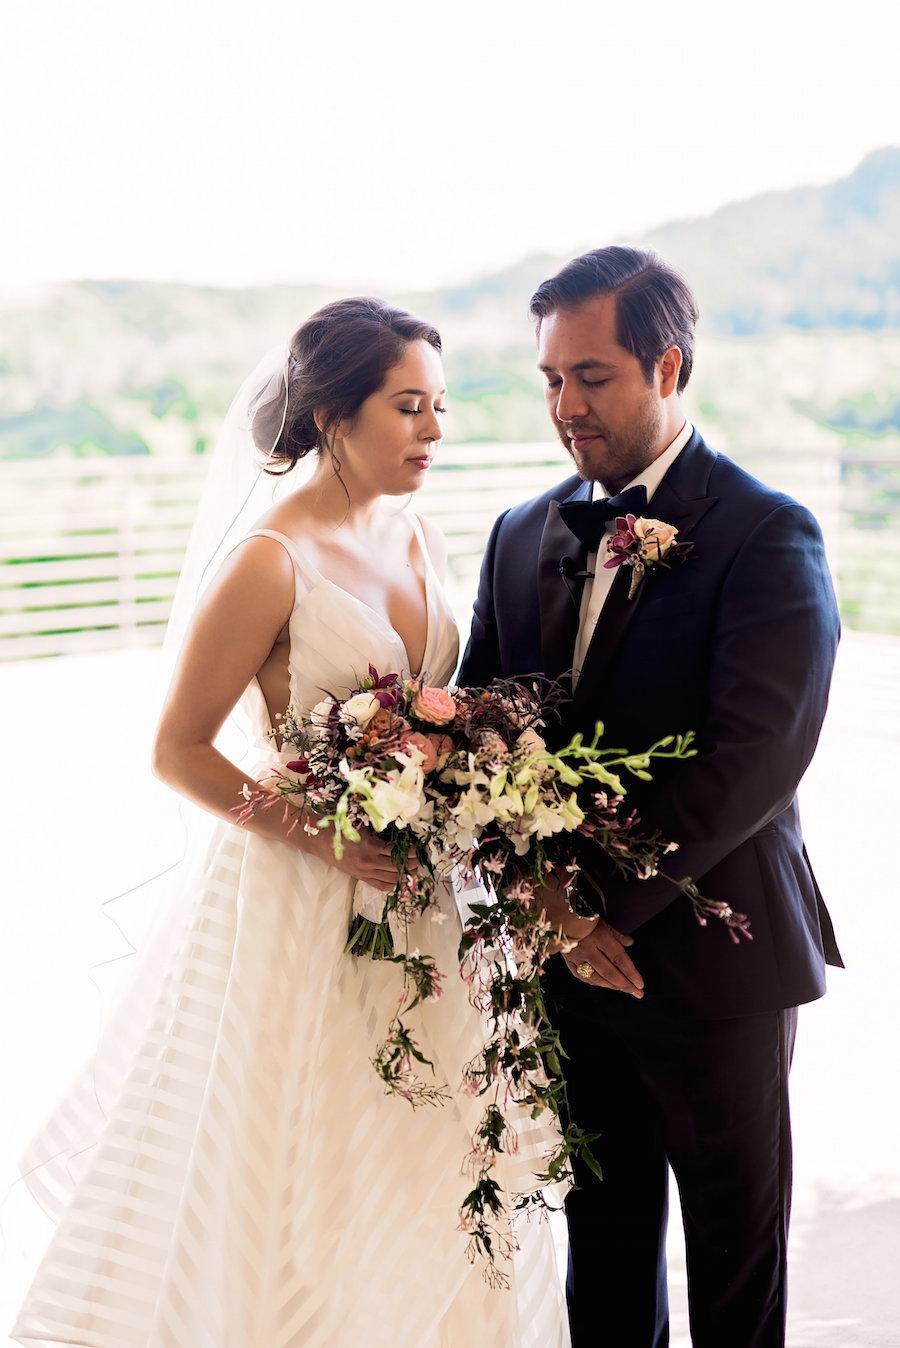 Rachel-Sergio-Wedding-Pharris-Photos-0073.jpg